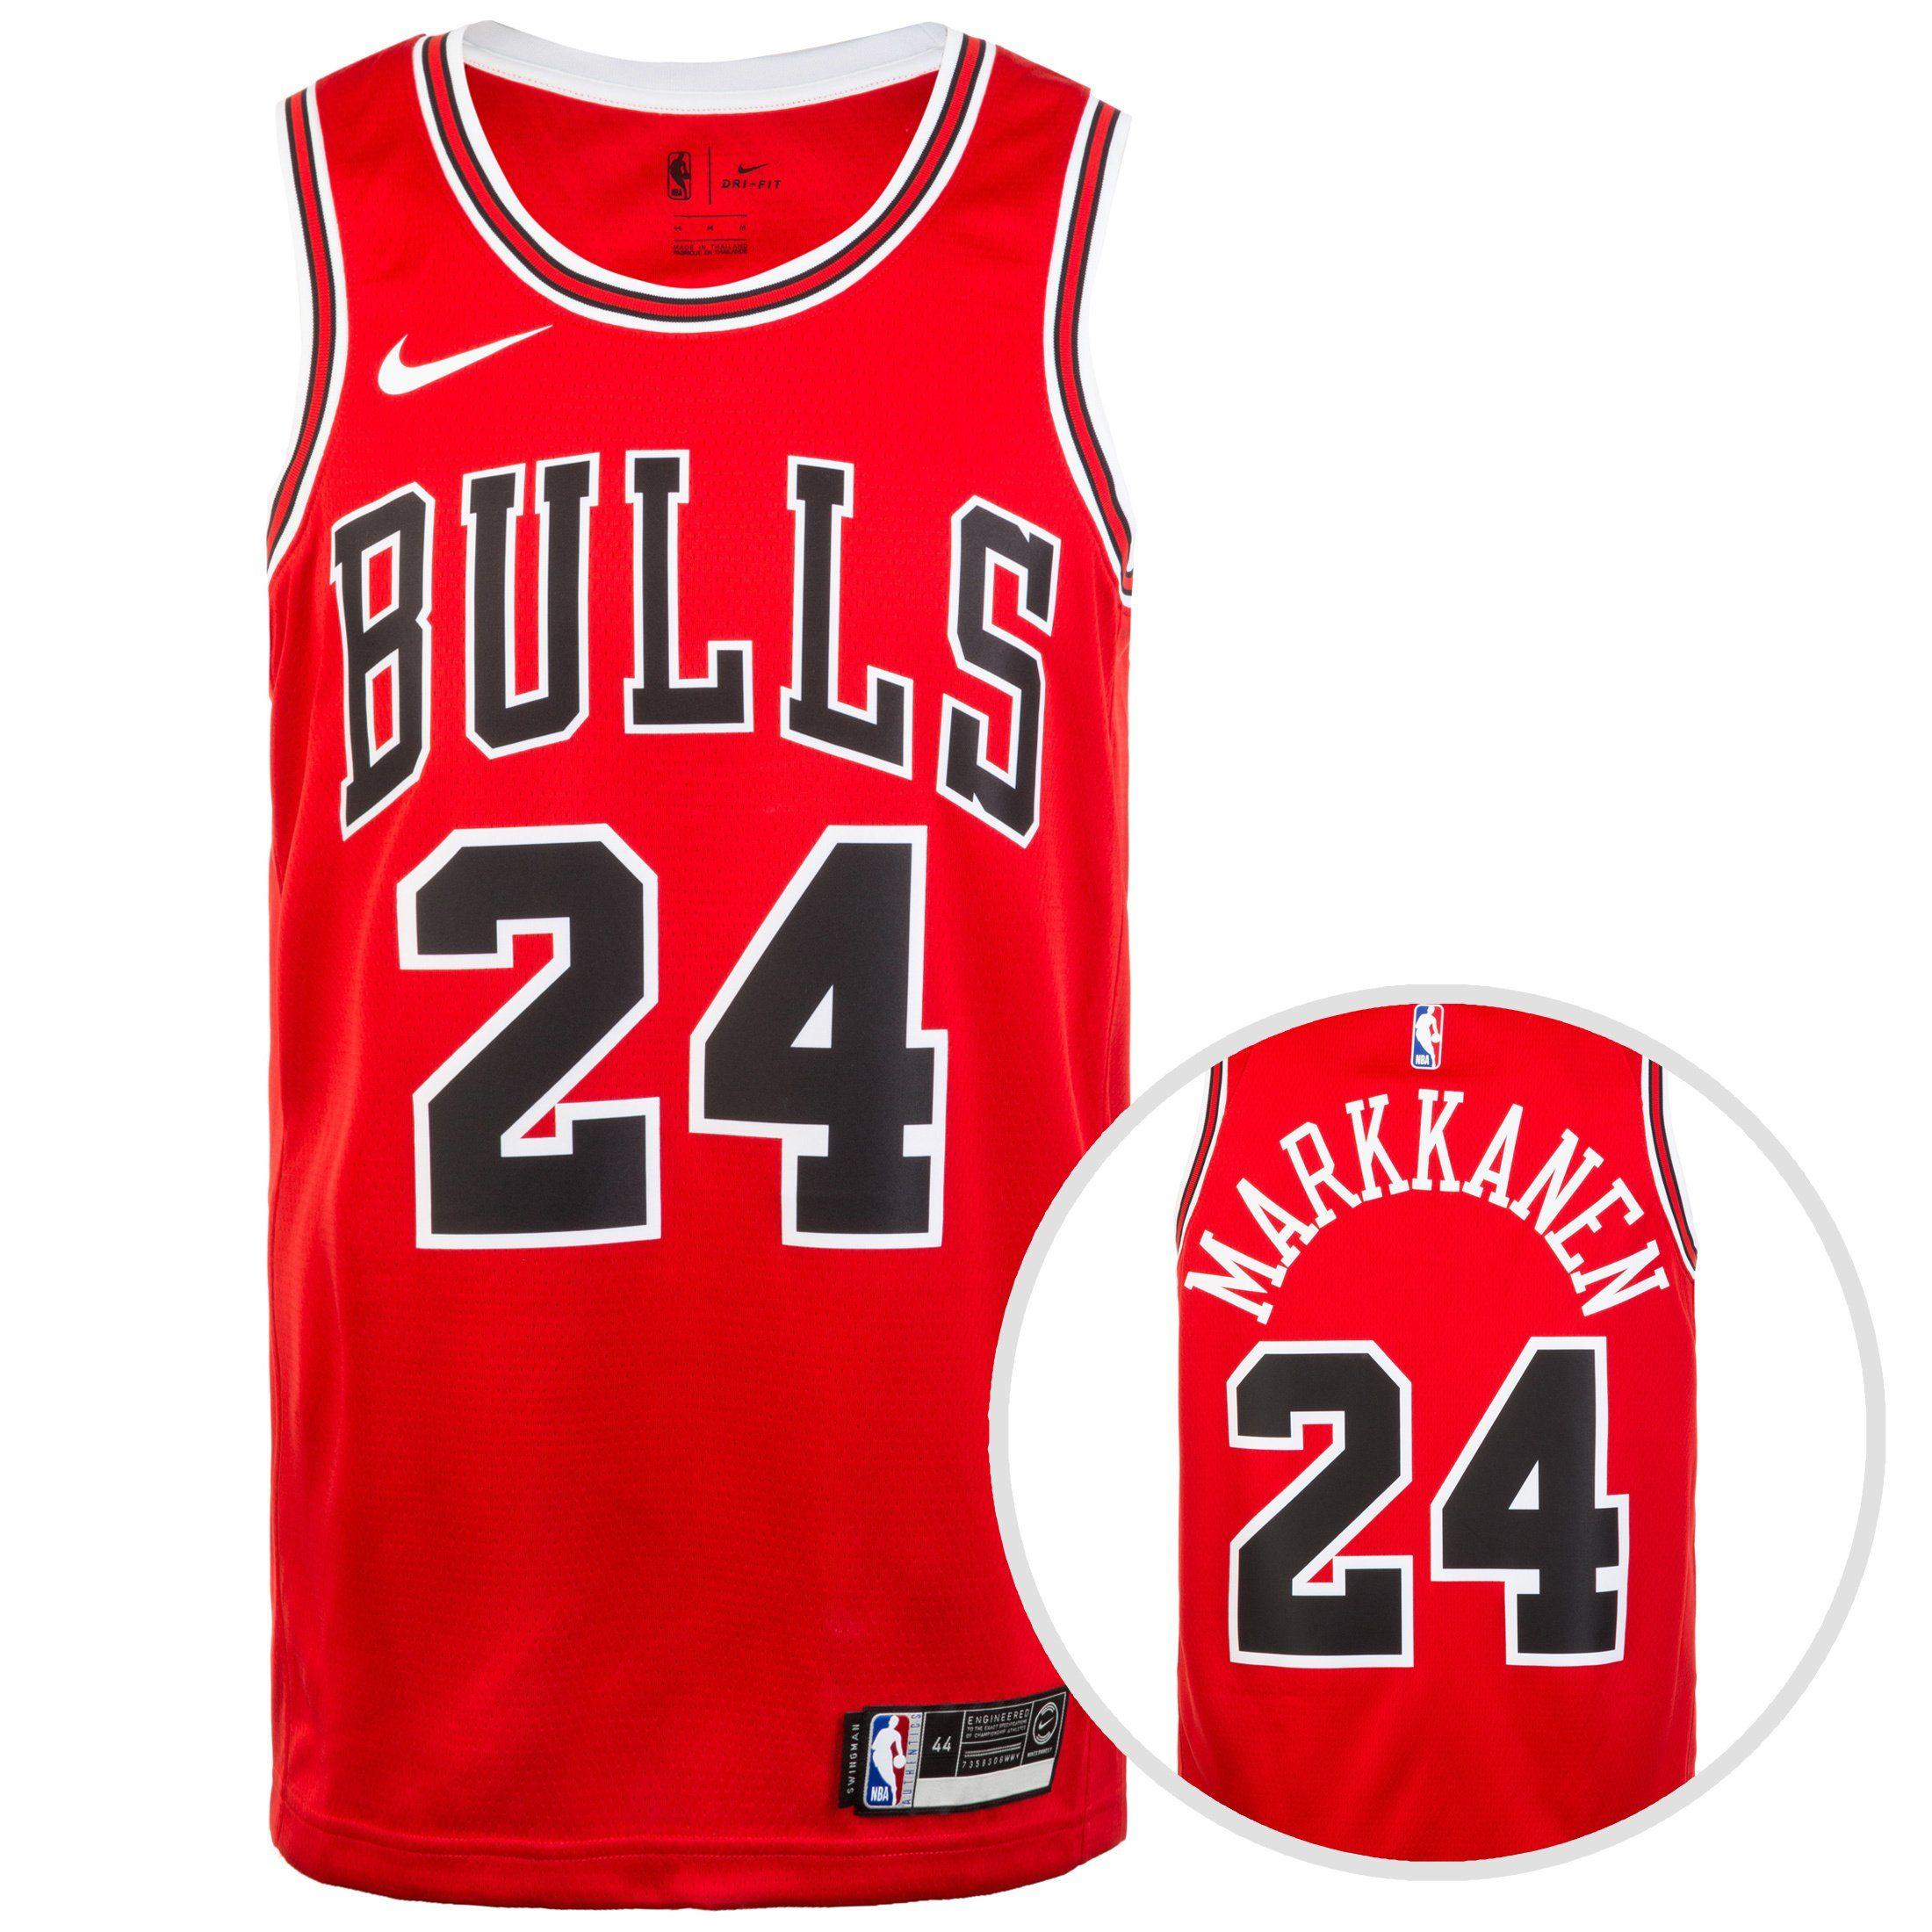 Nike Basketballtrikot »Chicago Buls Nba Swingman« | Sportbekleidung > Trikots > Basketballtrikots | Rot | Trikot | Nike